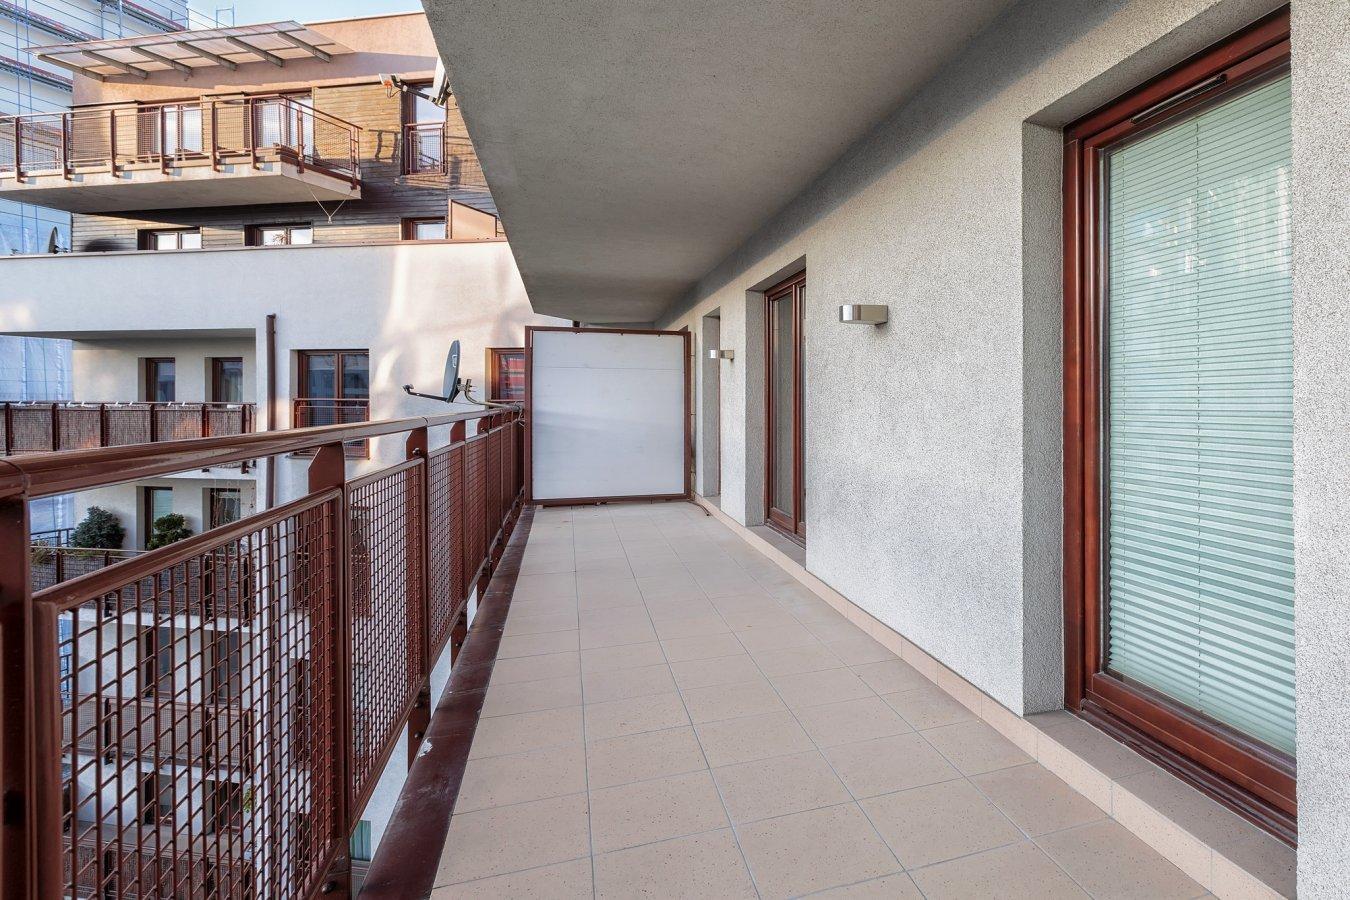 Balcony at Zeligowskiego Apartments